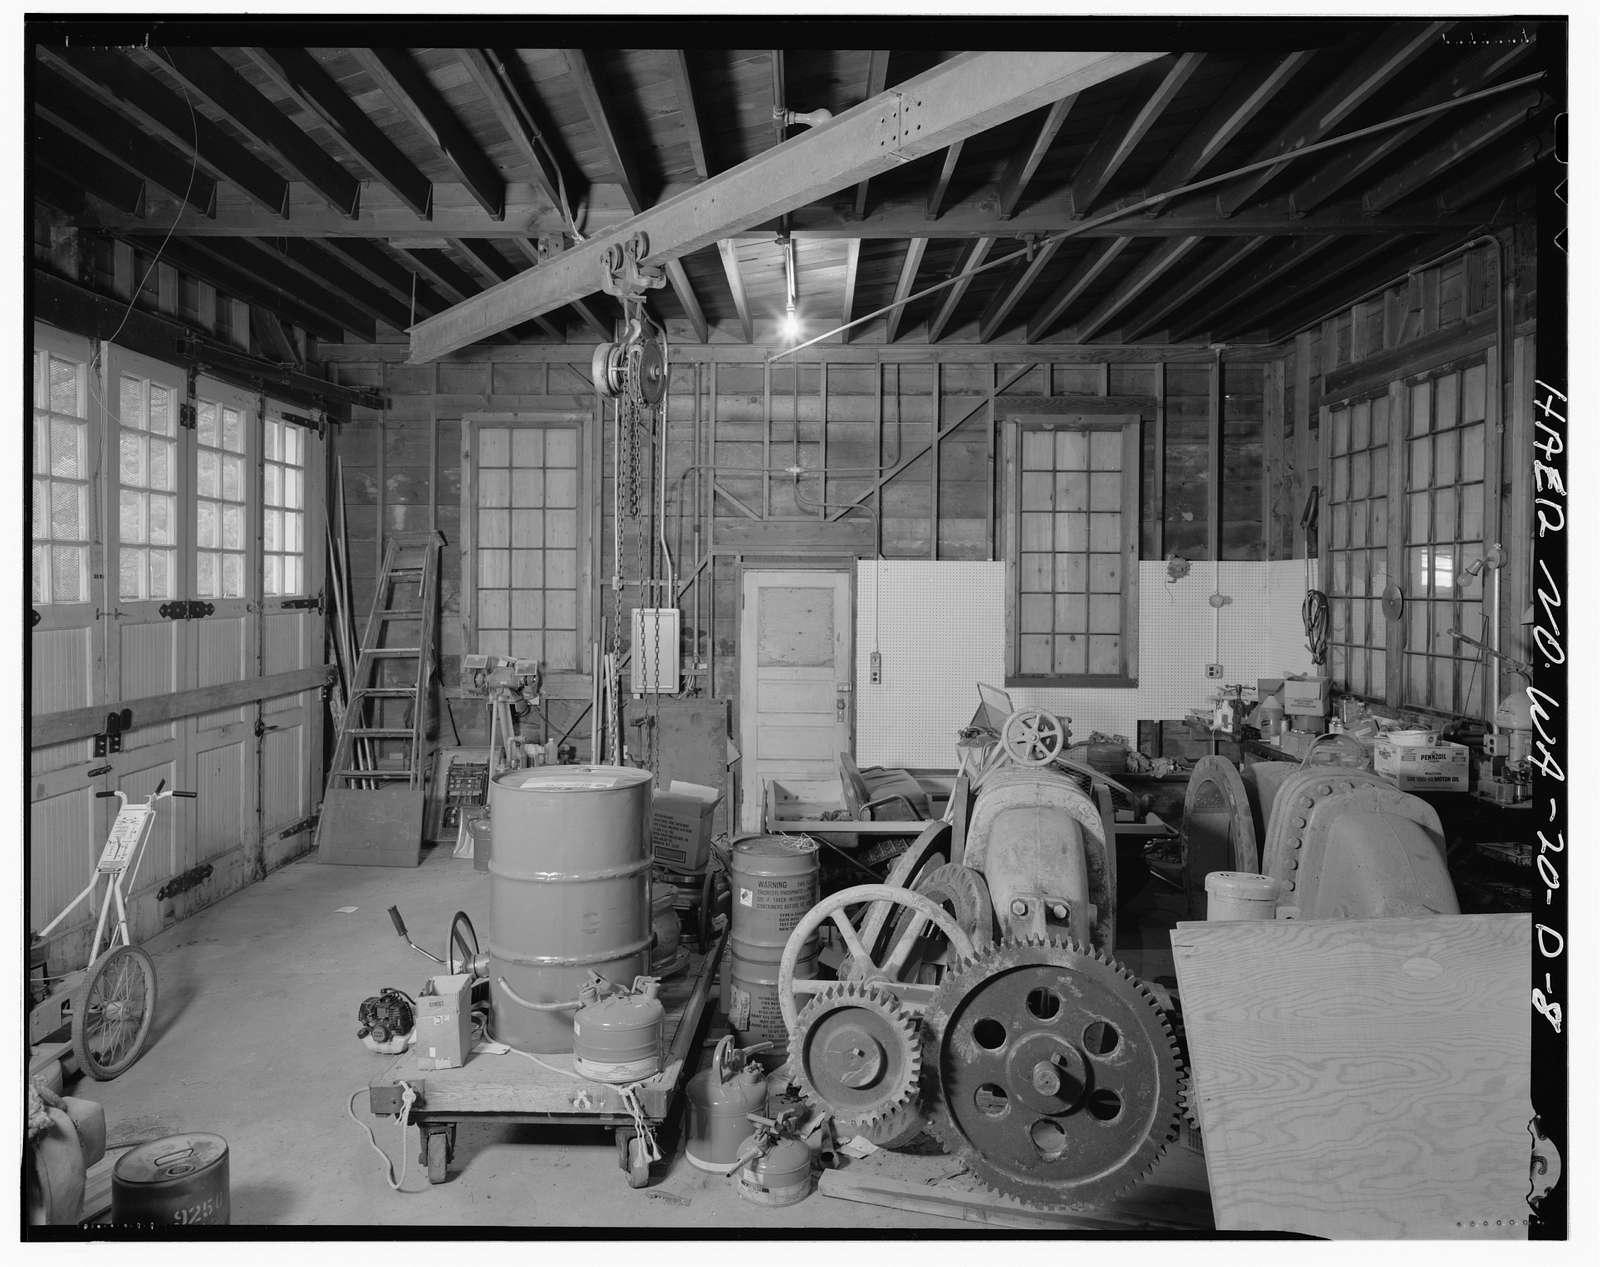 Tieton Dam, Construction Camp Warehouse-Shop, South & East side of State Highway 12, Naches, Yakima County, WA